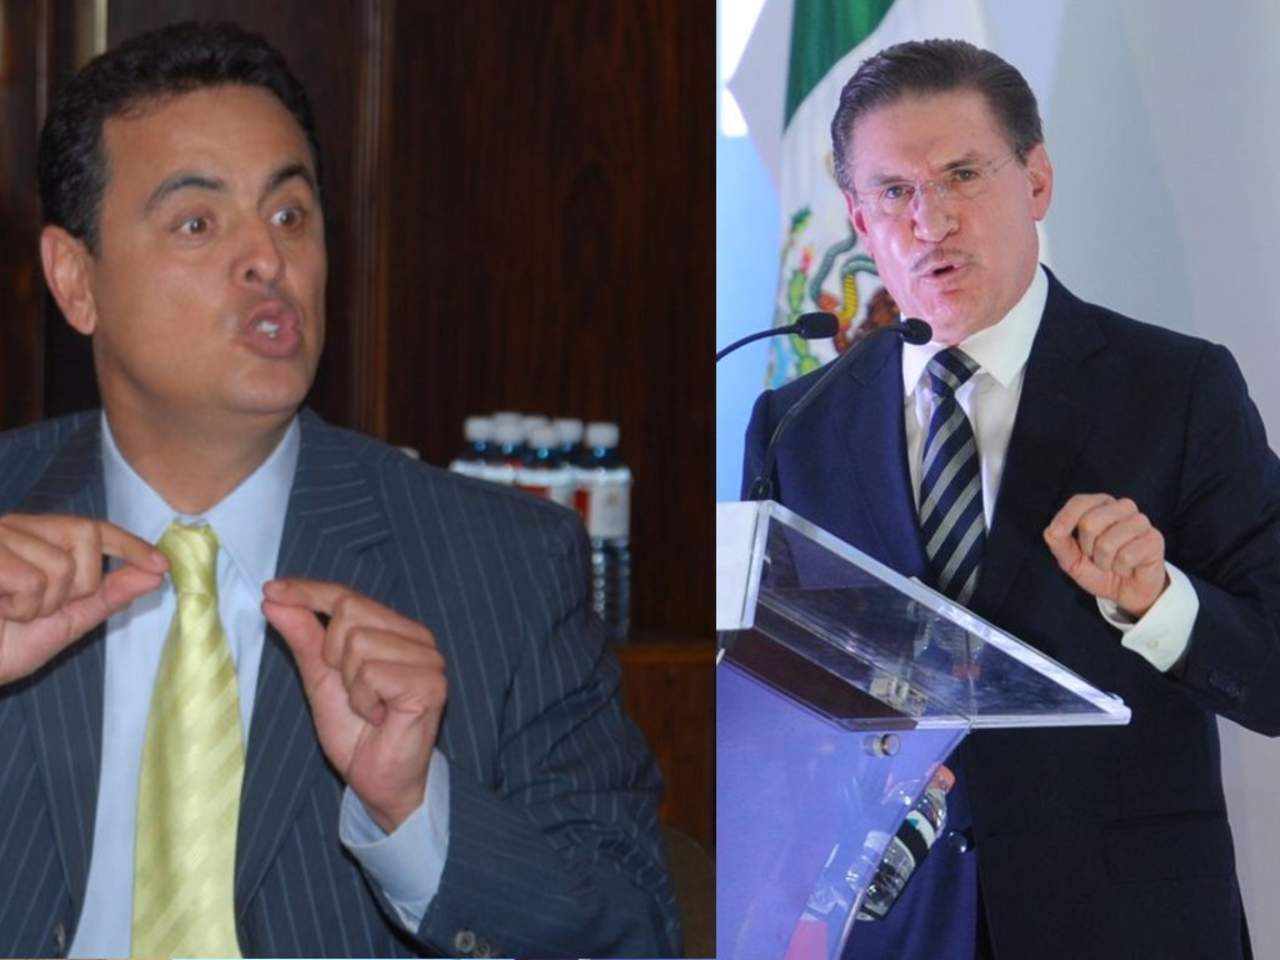 El software Pegasus se usó para espiar a Aispuro e Ismael Hernández